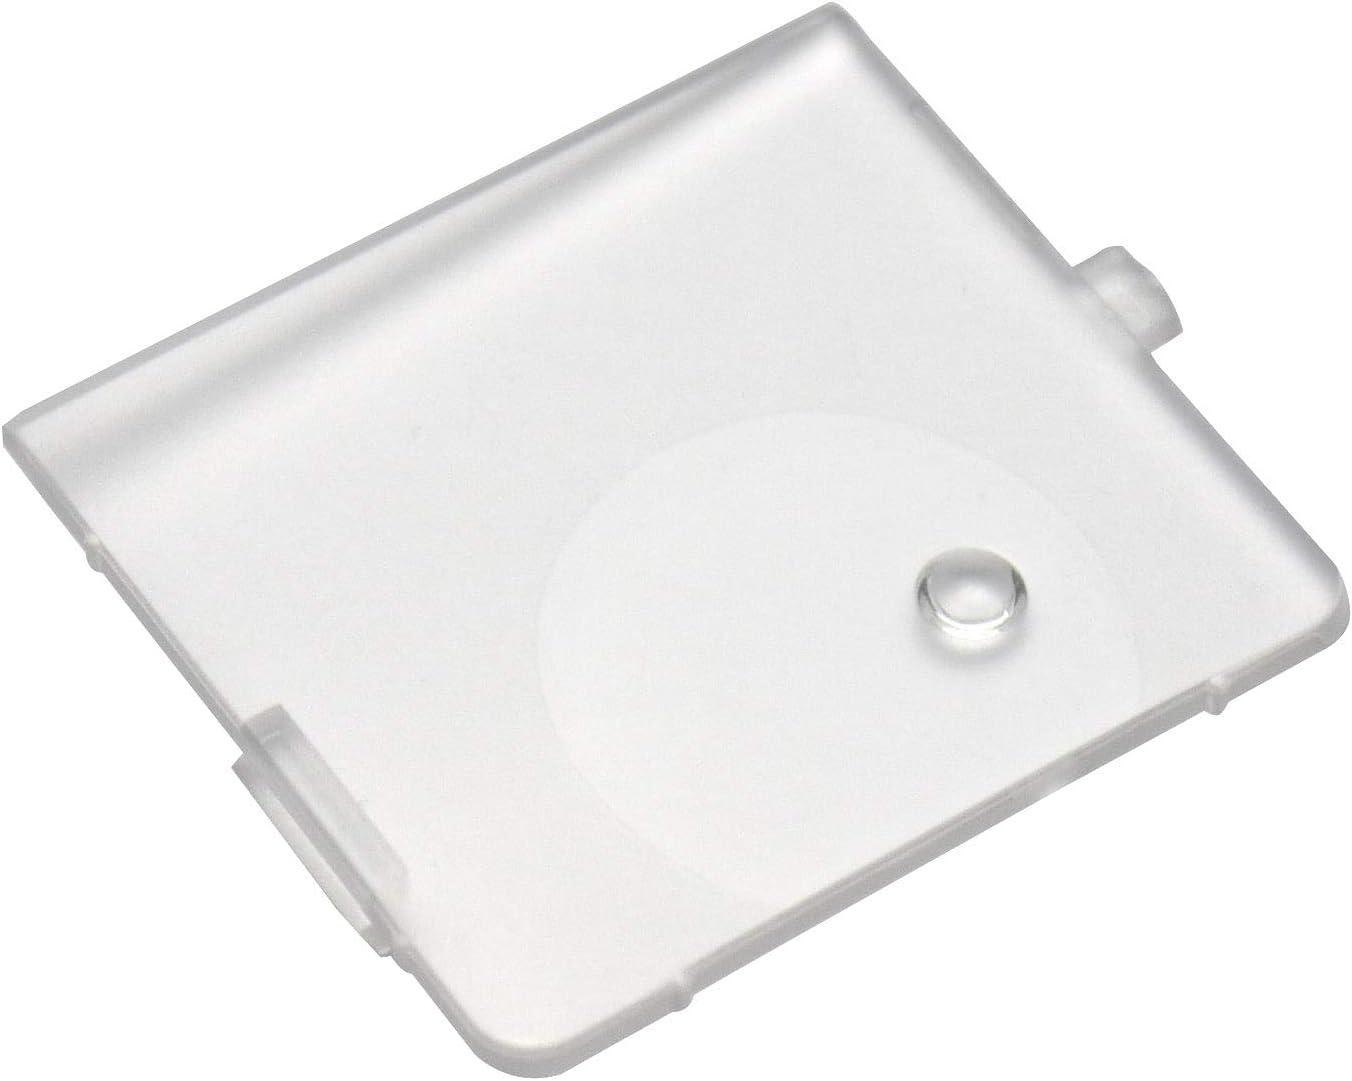 DREAMSTITCH NB1293000 Bobbin Cover Plate for EuroPro, Pfaff, Singer, White, Viking Sewing Machine ALT:416156101, NB0243000 NB1293000